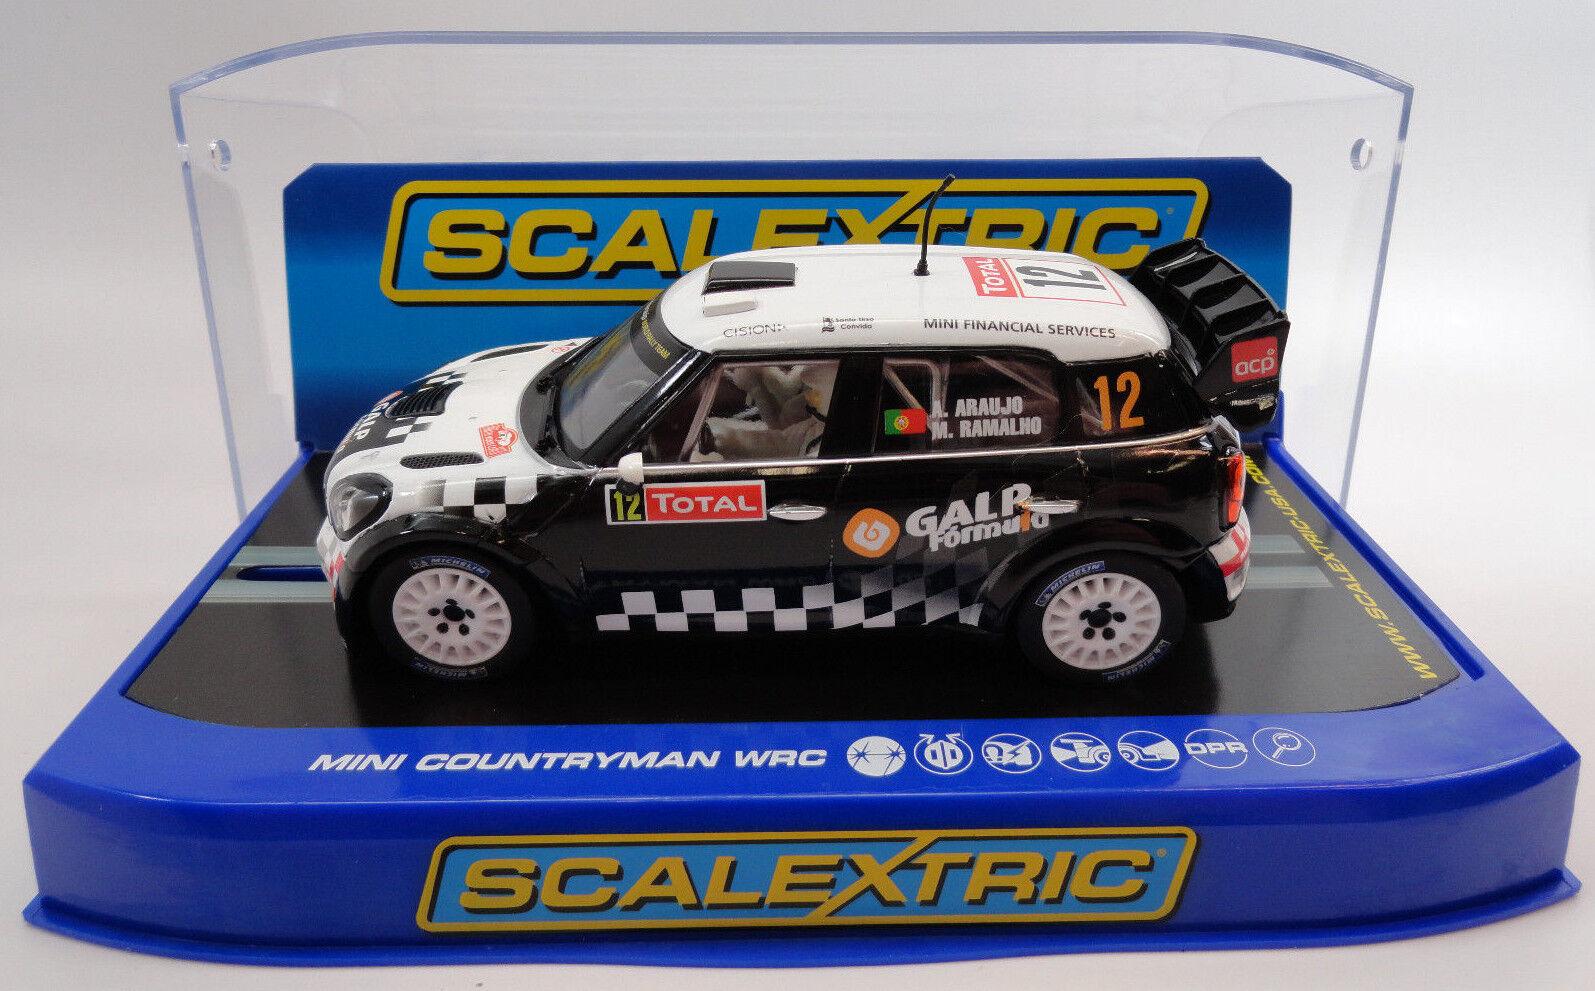 Scalextric  Galp  Mini Countryman WRC DPR W  Lights 1 32 Slot Car C3385